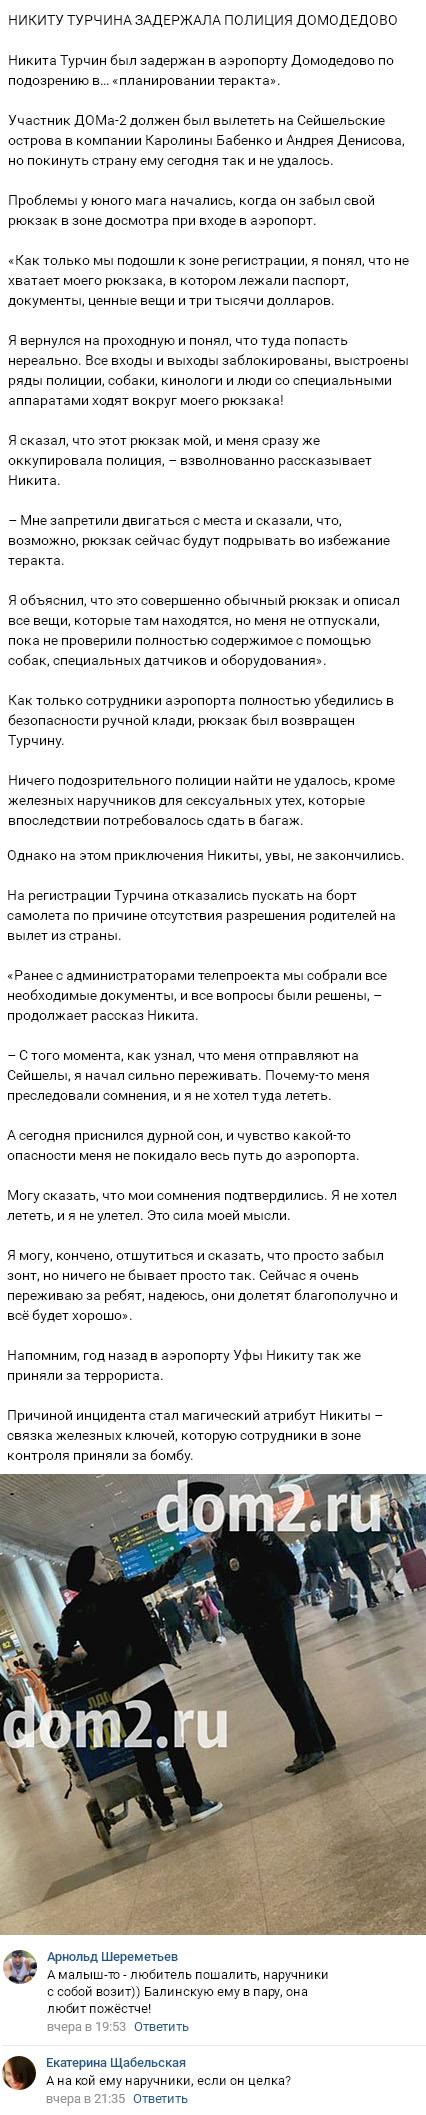 Никиту Турчина задержали в аэропорту Домодедово как террориста